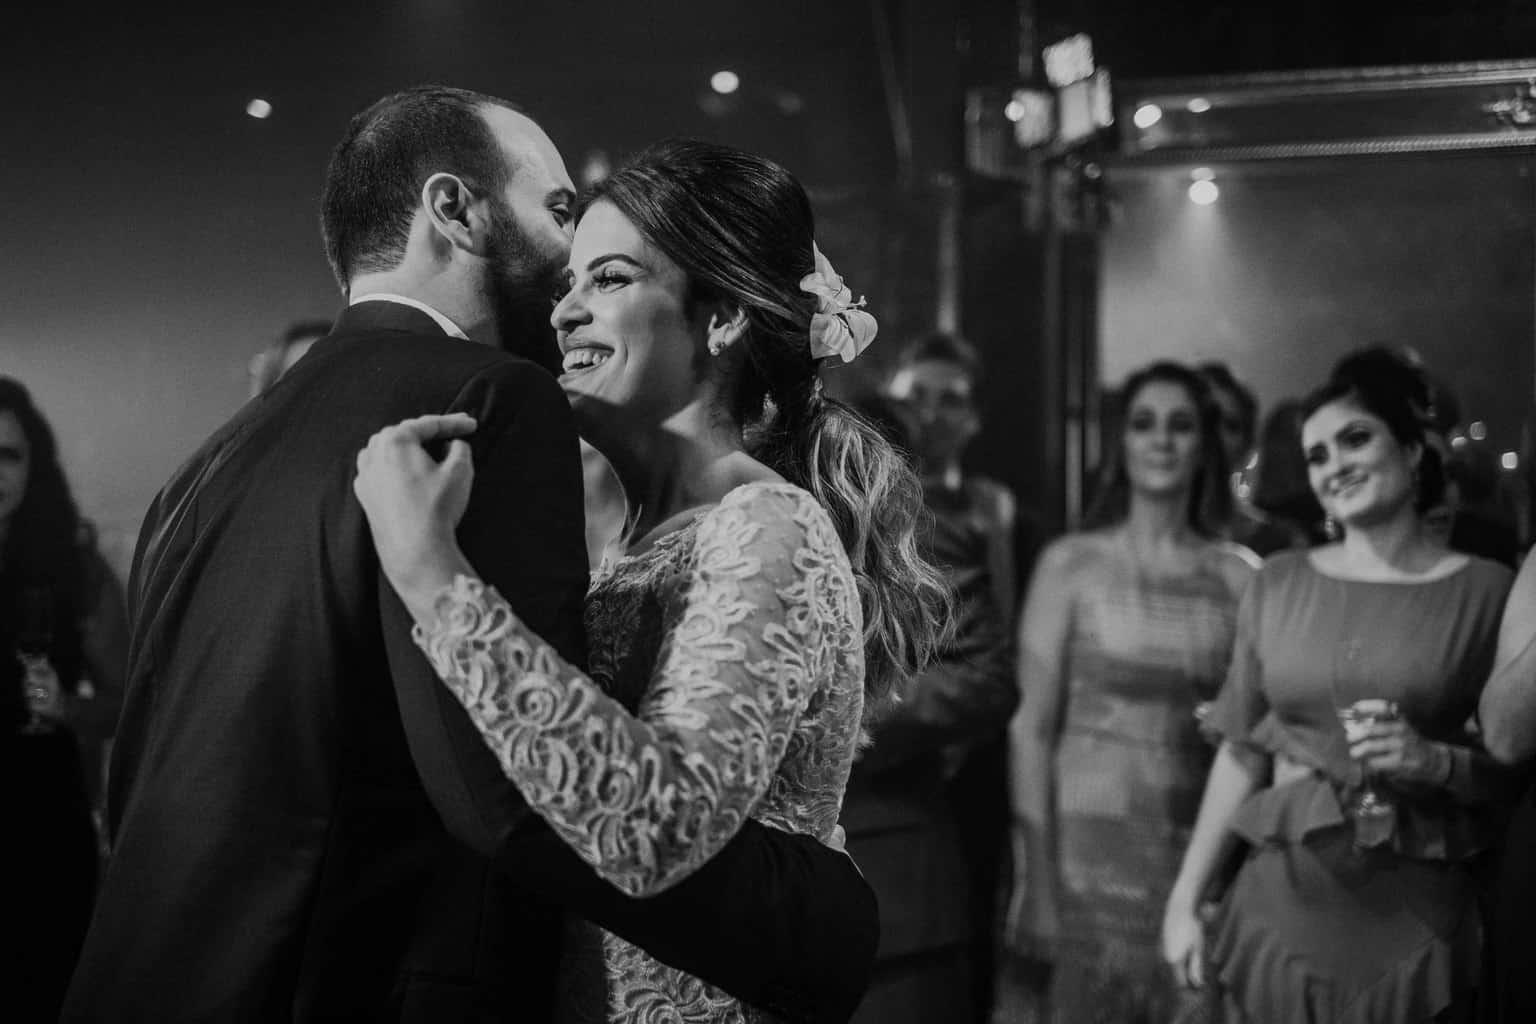 casamento-na-serra-danca-do-casal-festa-de-casamento-Fotografia-Renata-Xavier-Les-Amies-Cerimonial-Locanda-Della-Mimosa-Natalia-e-Bruno576